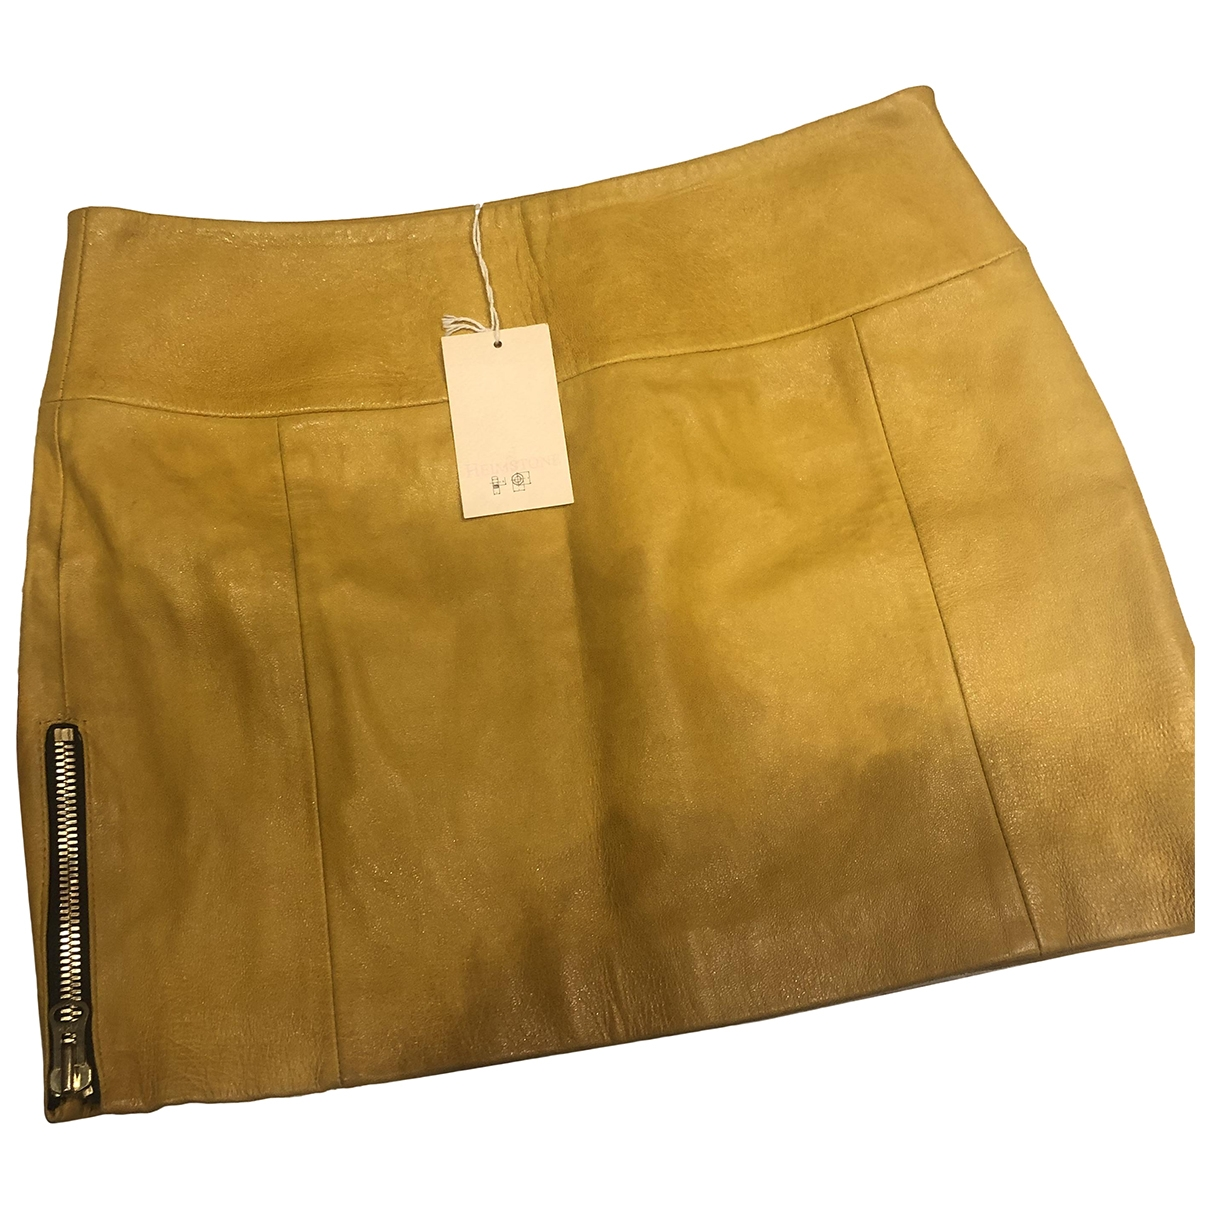 Heimstone \N Yellow Leather skirt for Women 36 FR